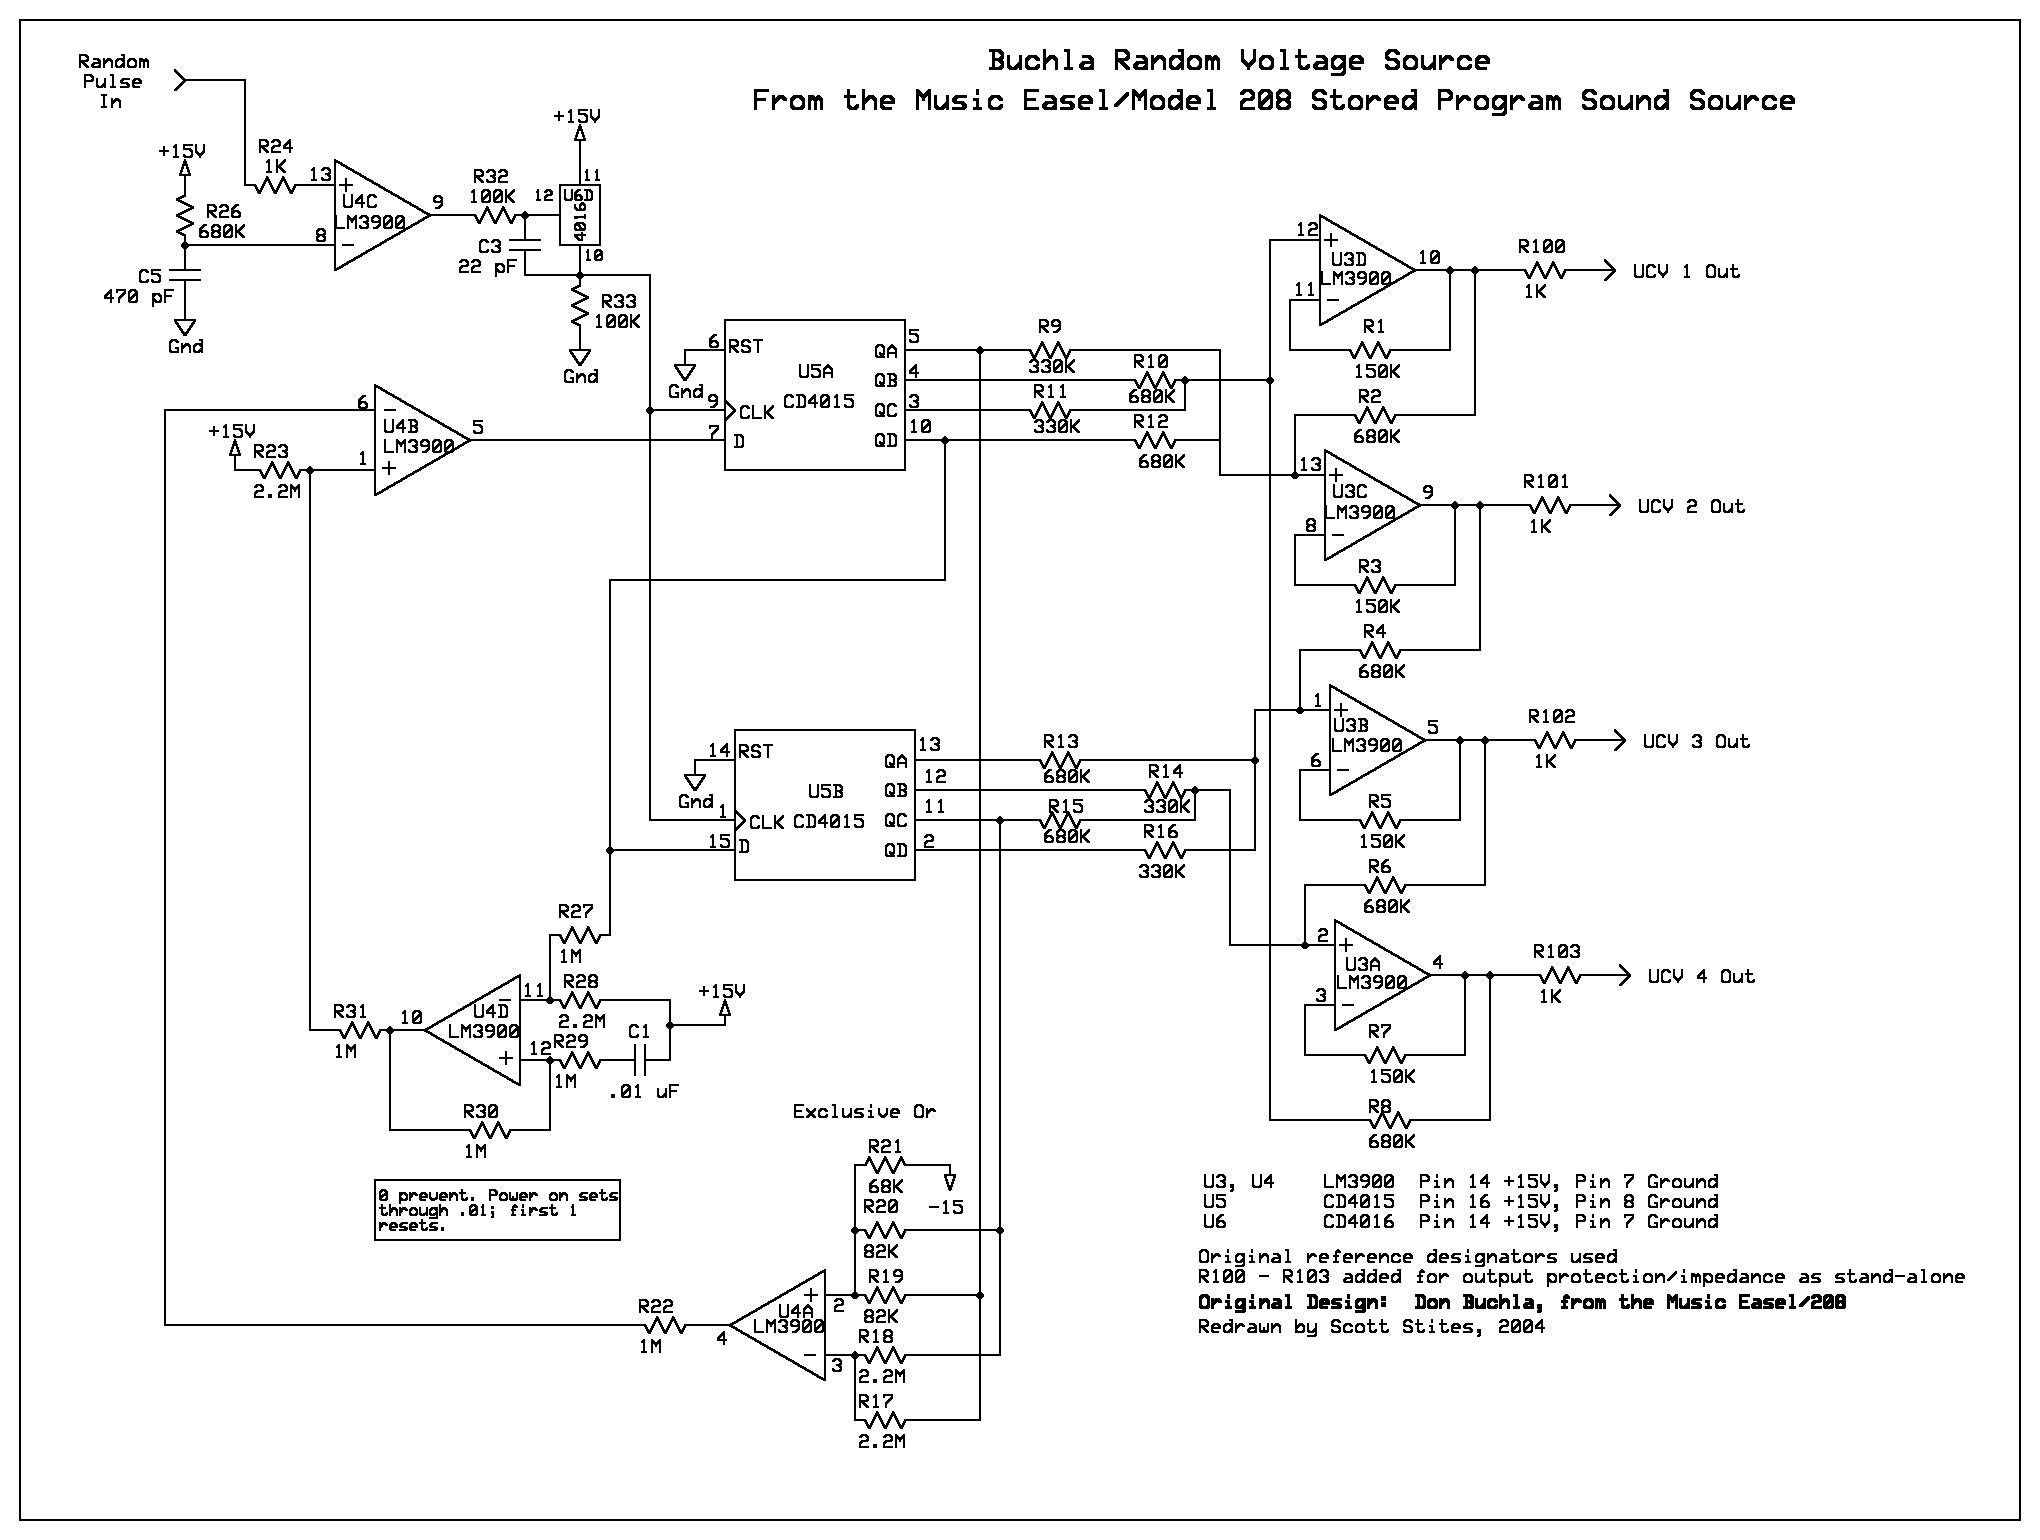 electro-music.com wiki | Schematics / Buchla 208